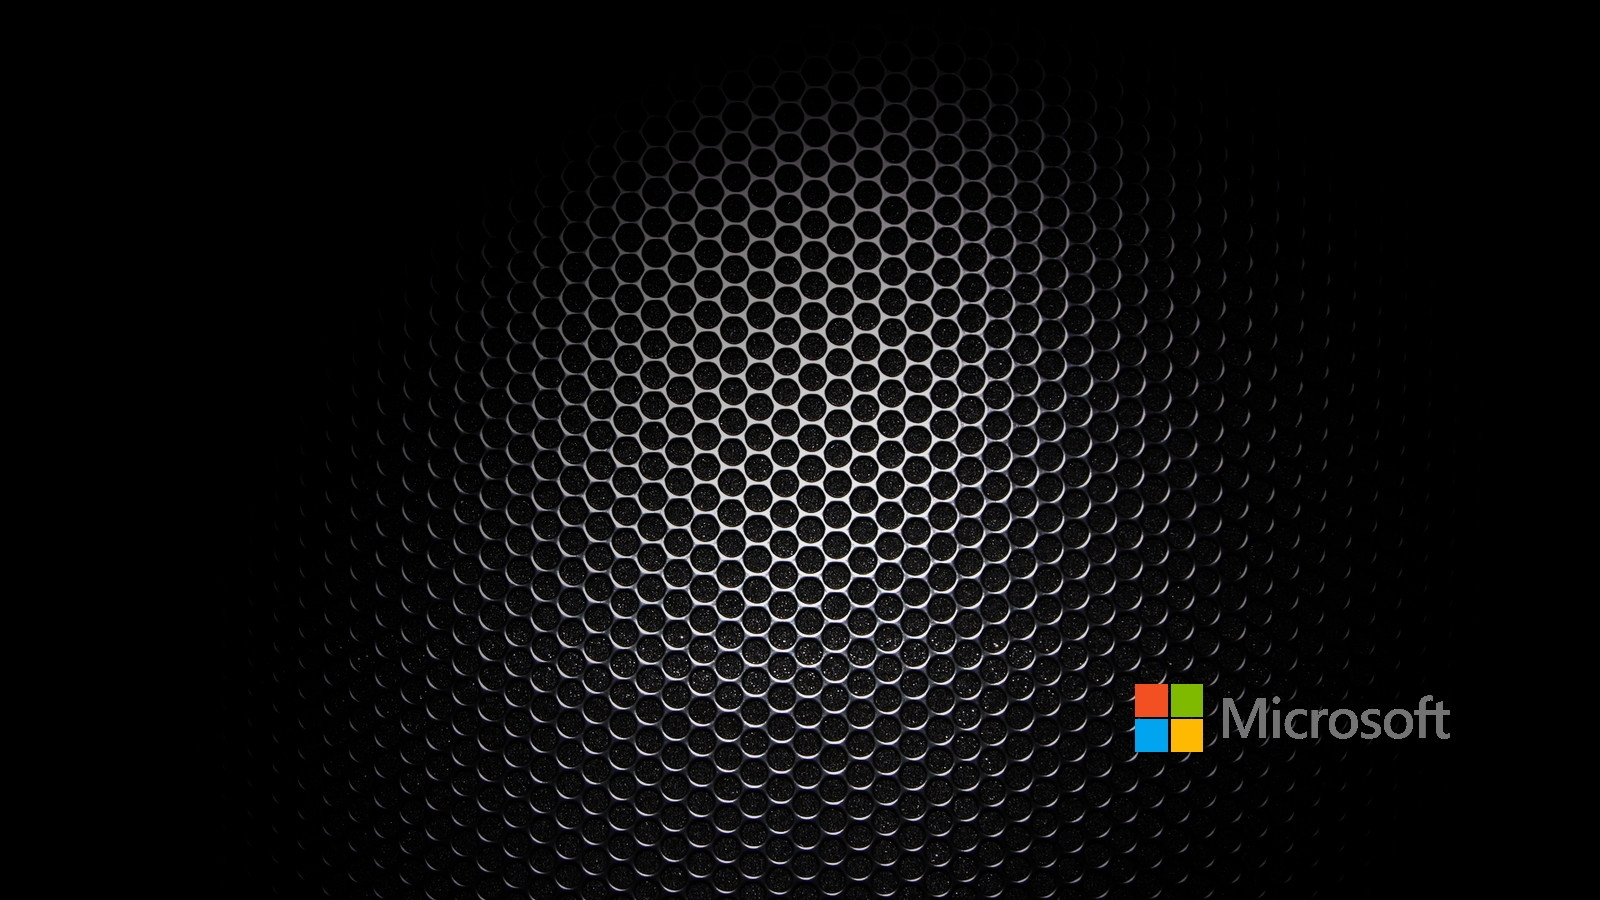 Microsoft Wallpaper 04